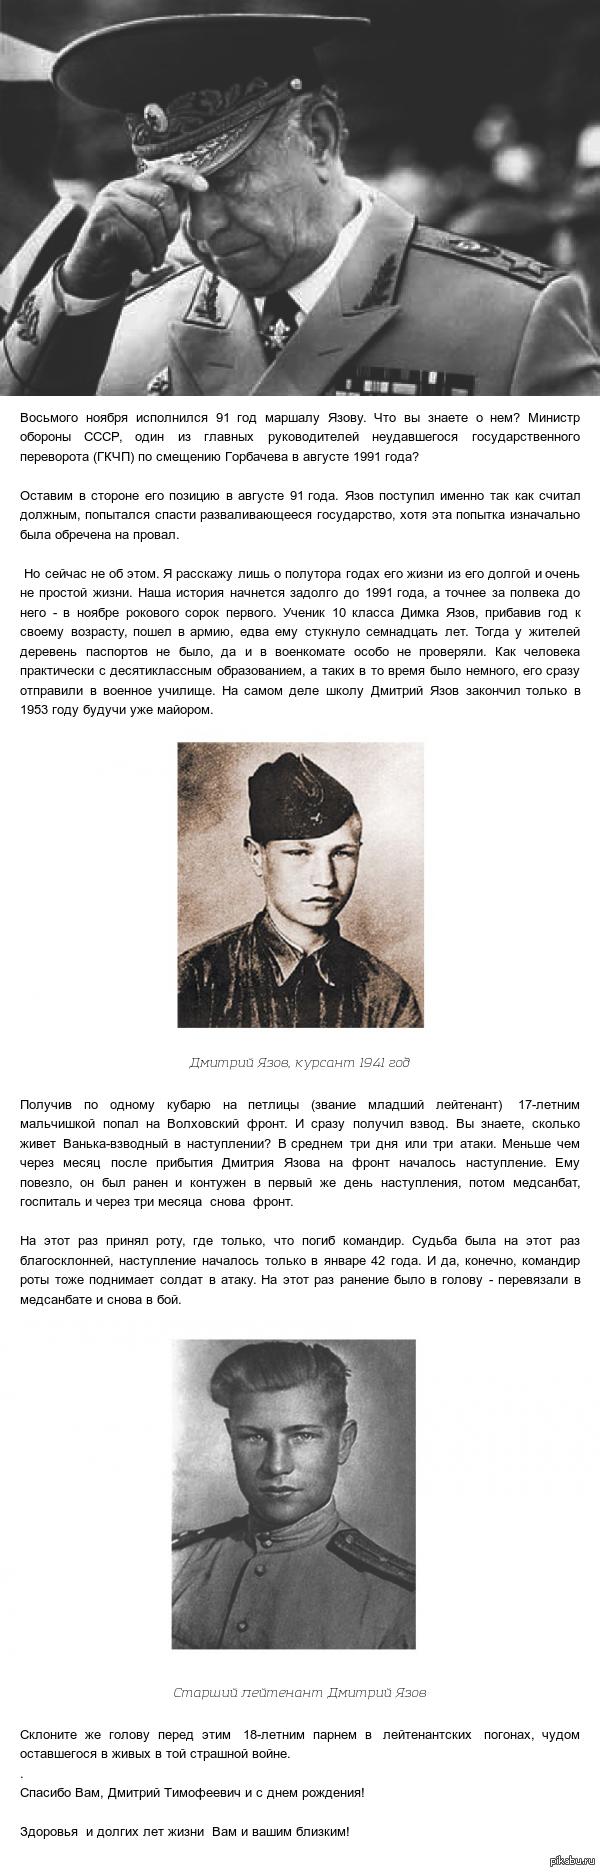 Спасибо Вам, Дмитрий Тимофеевич! маршал Язов